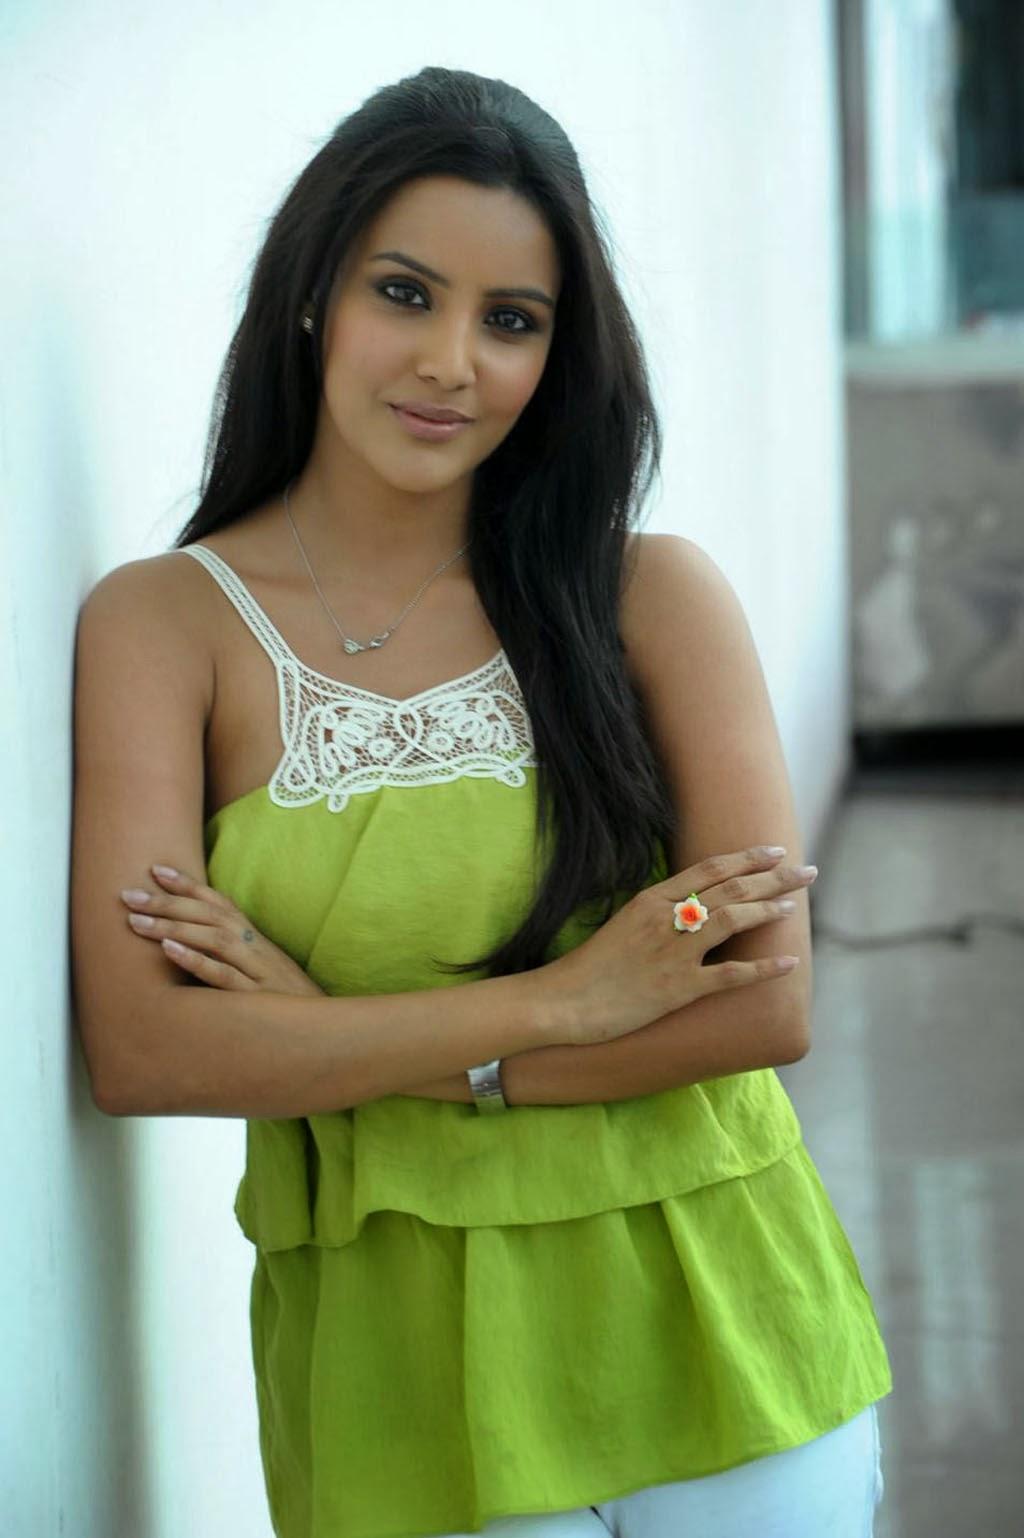 priya anand hd photos download free | tv biography